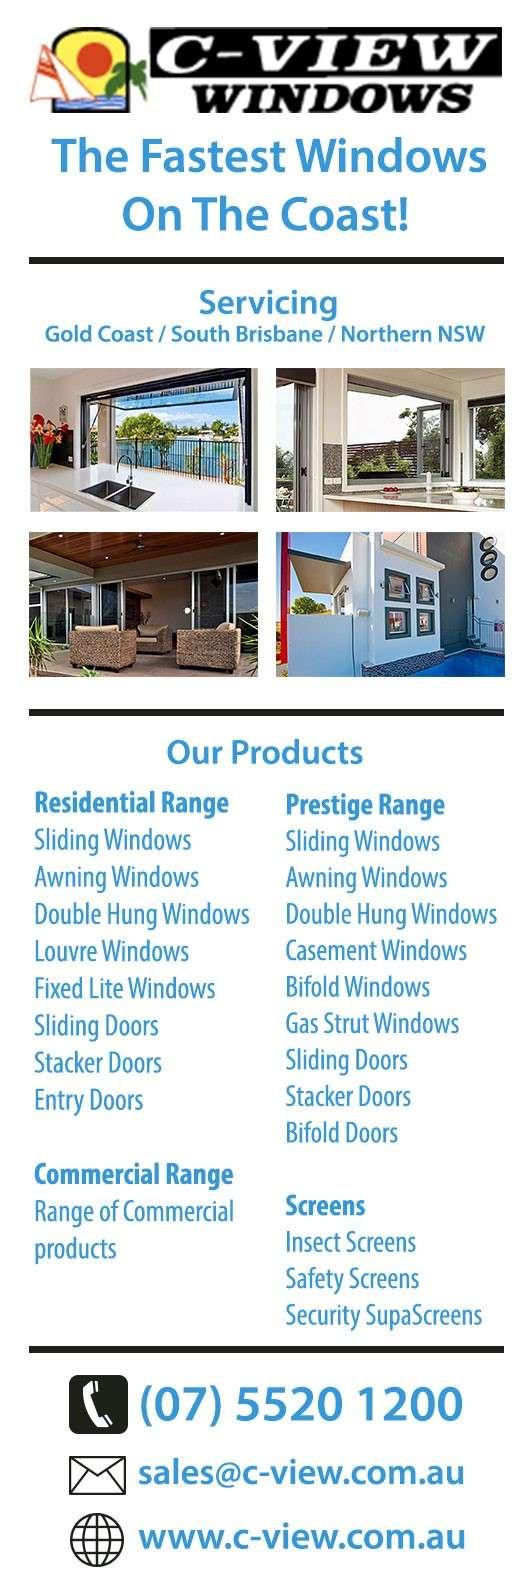 C-View Windows - Aluminium Windows - 25 Dover Drive - Burleigh Heads